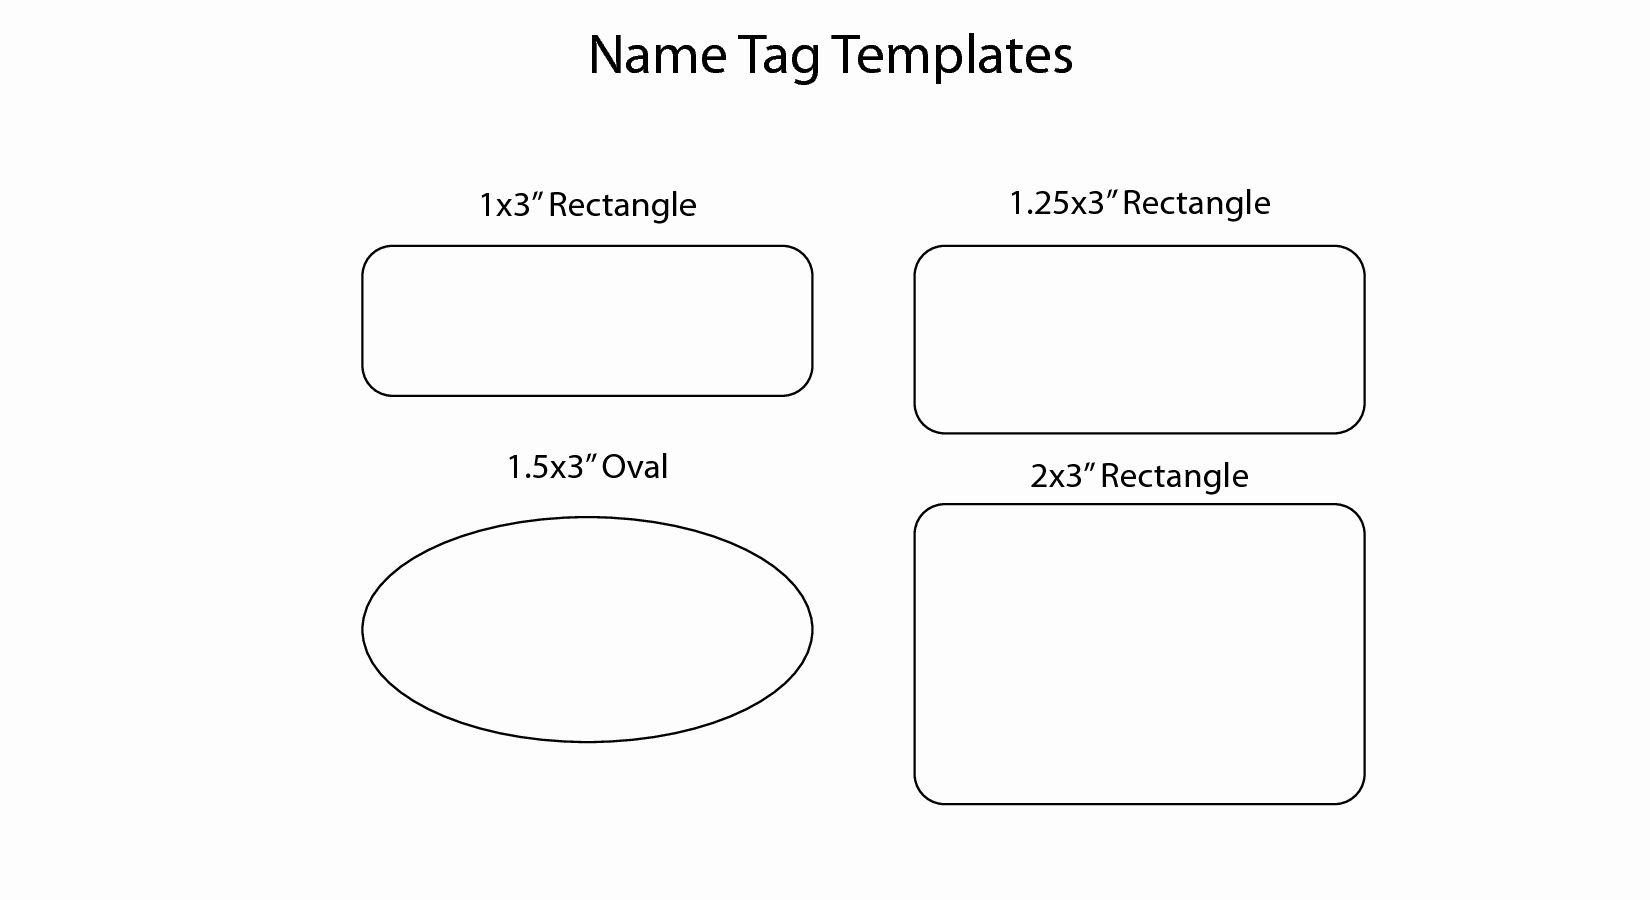 Name Tag Template Free Printable Lovely 14 Name Badge Templates Christmas Name Badge Name Tag Templates Templates Printable Free Tag Template Free Free name badge template word